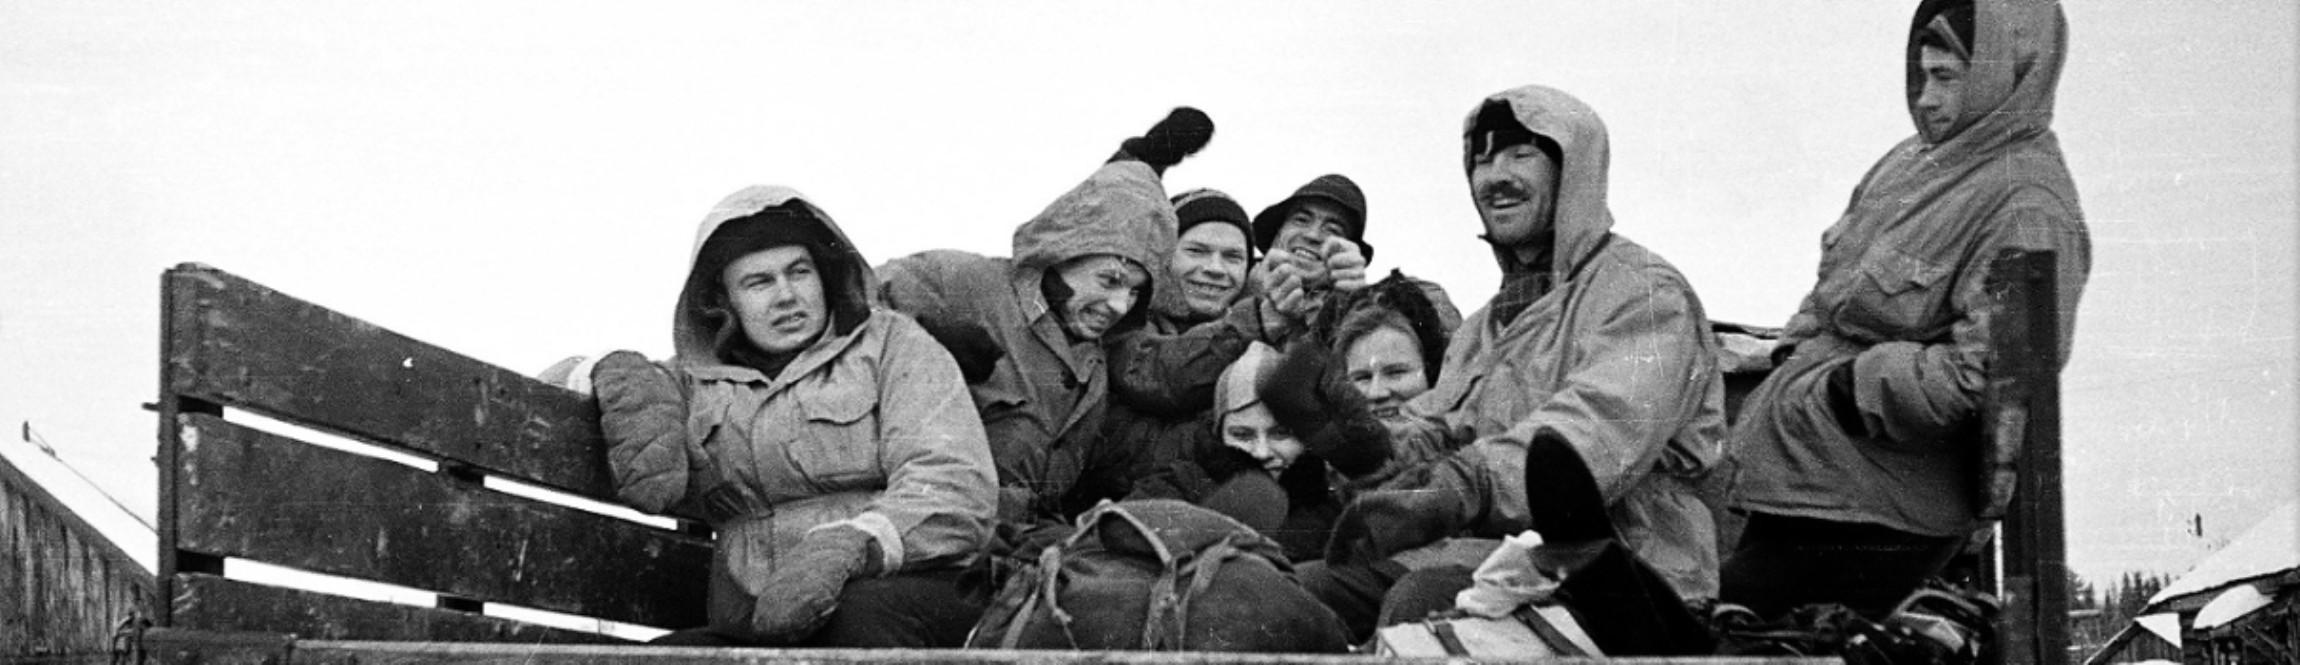 misterio expedicion rusa 20